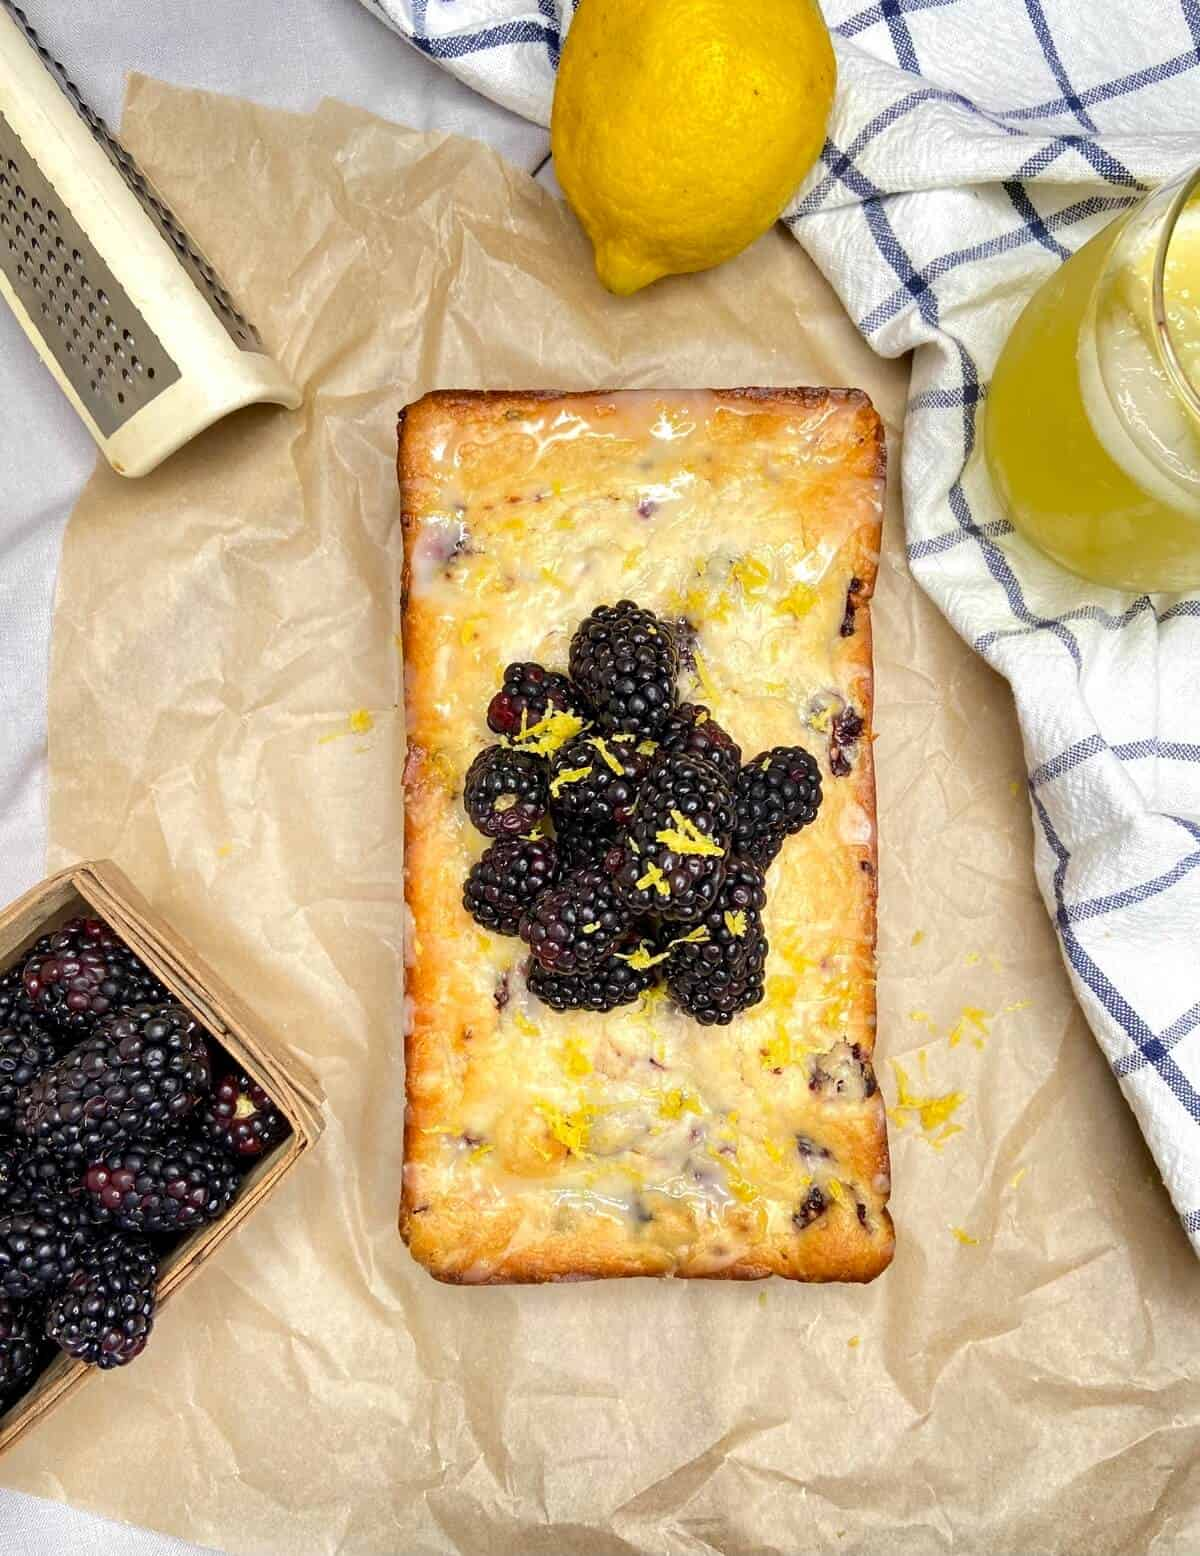 Lemon Blackberry Bread (Photo by Viana Boenzli)